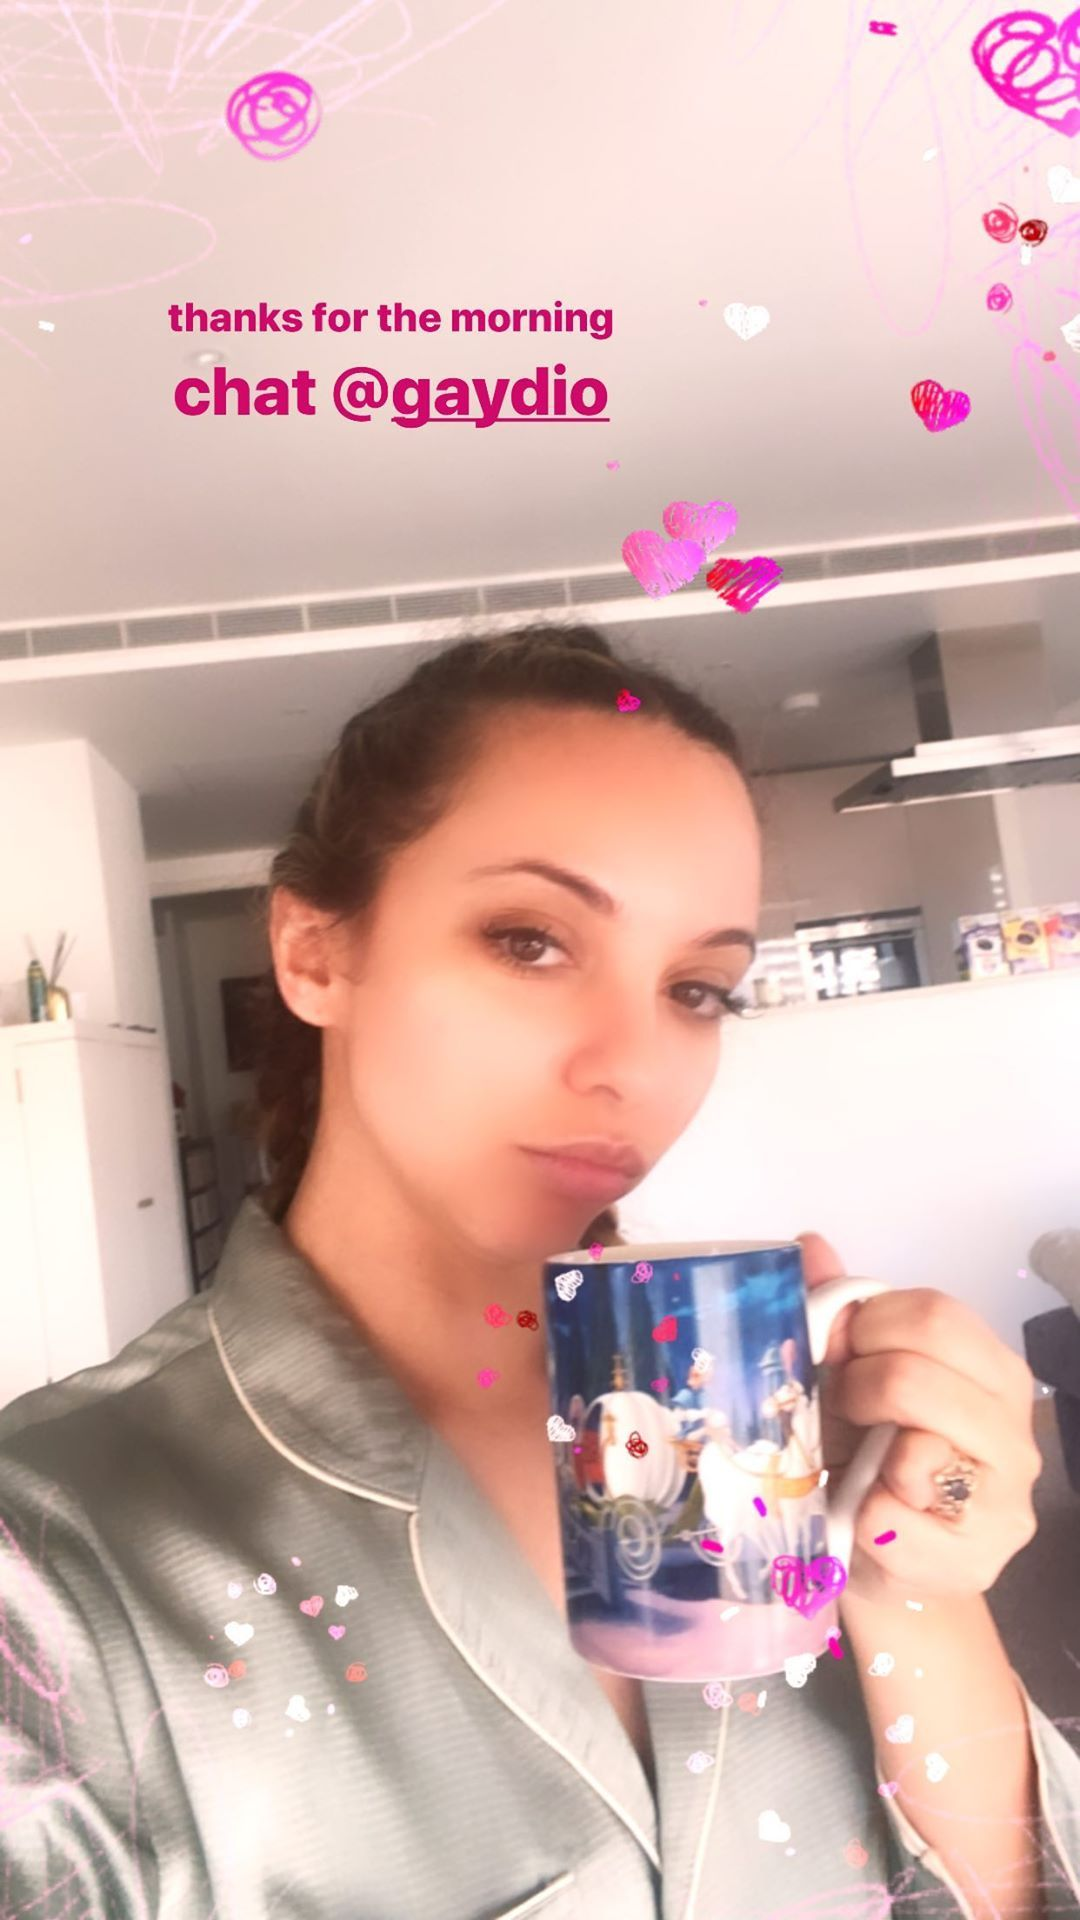 Jade via Instagram Stories, 7th April 2020 #jadethirlwall#jade#jade thirlwall#little mix #little mix news #instagram stories#filter#2020#070420#selfie#home#quarantine#gaydio